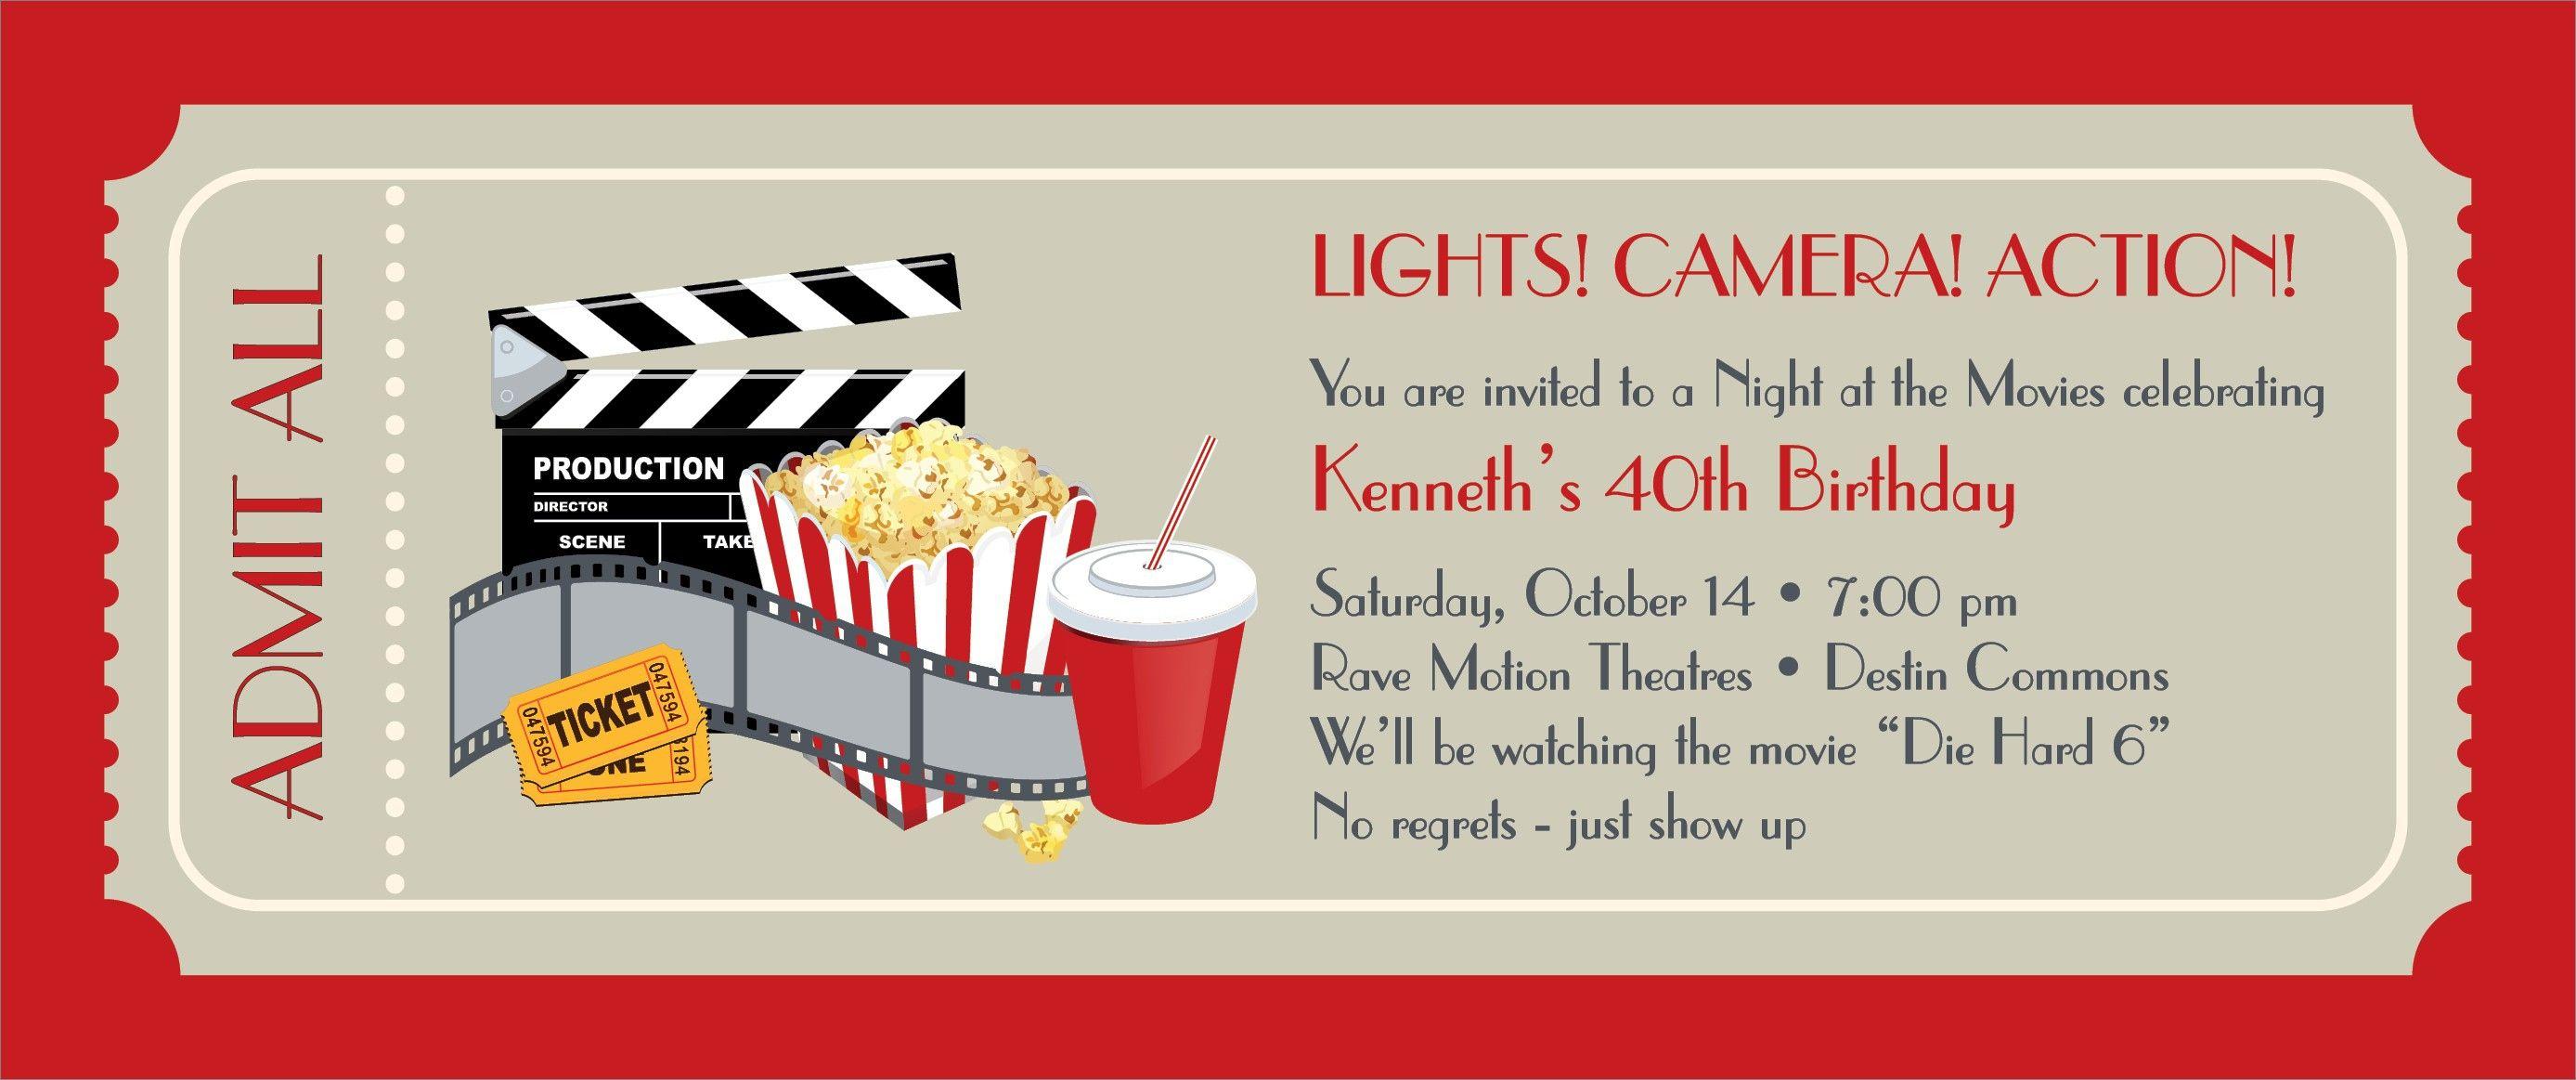 Free Printable Ticket Invitations Inspiration Movie Party Invitations Free Printable Insp Movie Night Invitations Party Invite Template Movie Party Invitations